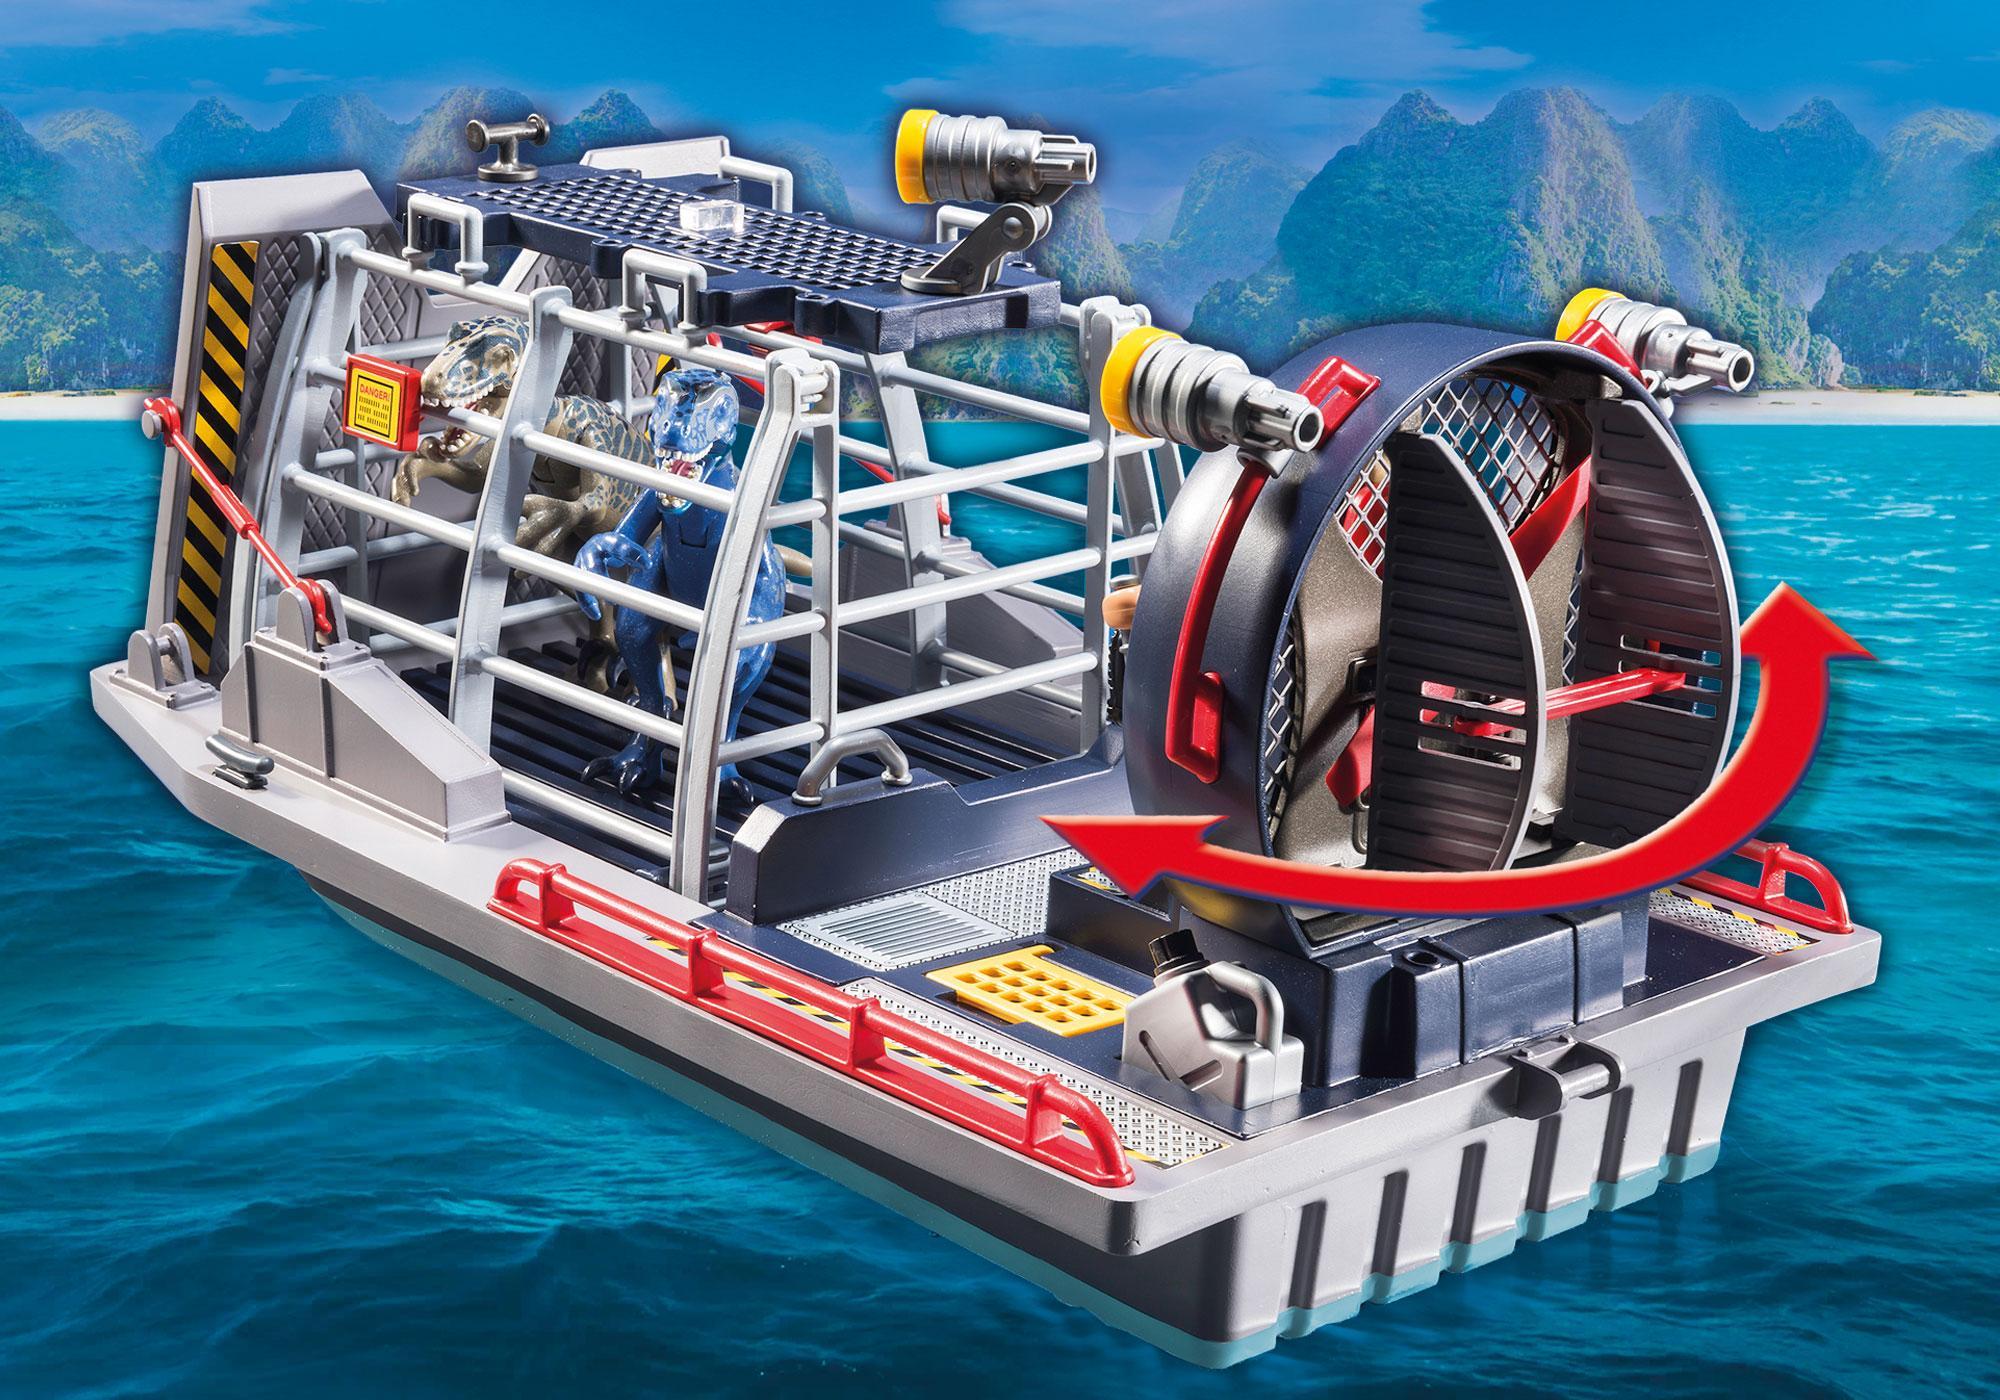 http://media.playmobil.com/i/playmobil/9433_product_extra2/Luchtkussenboot met dinokooi